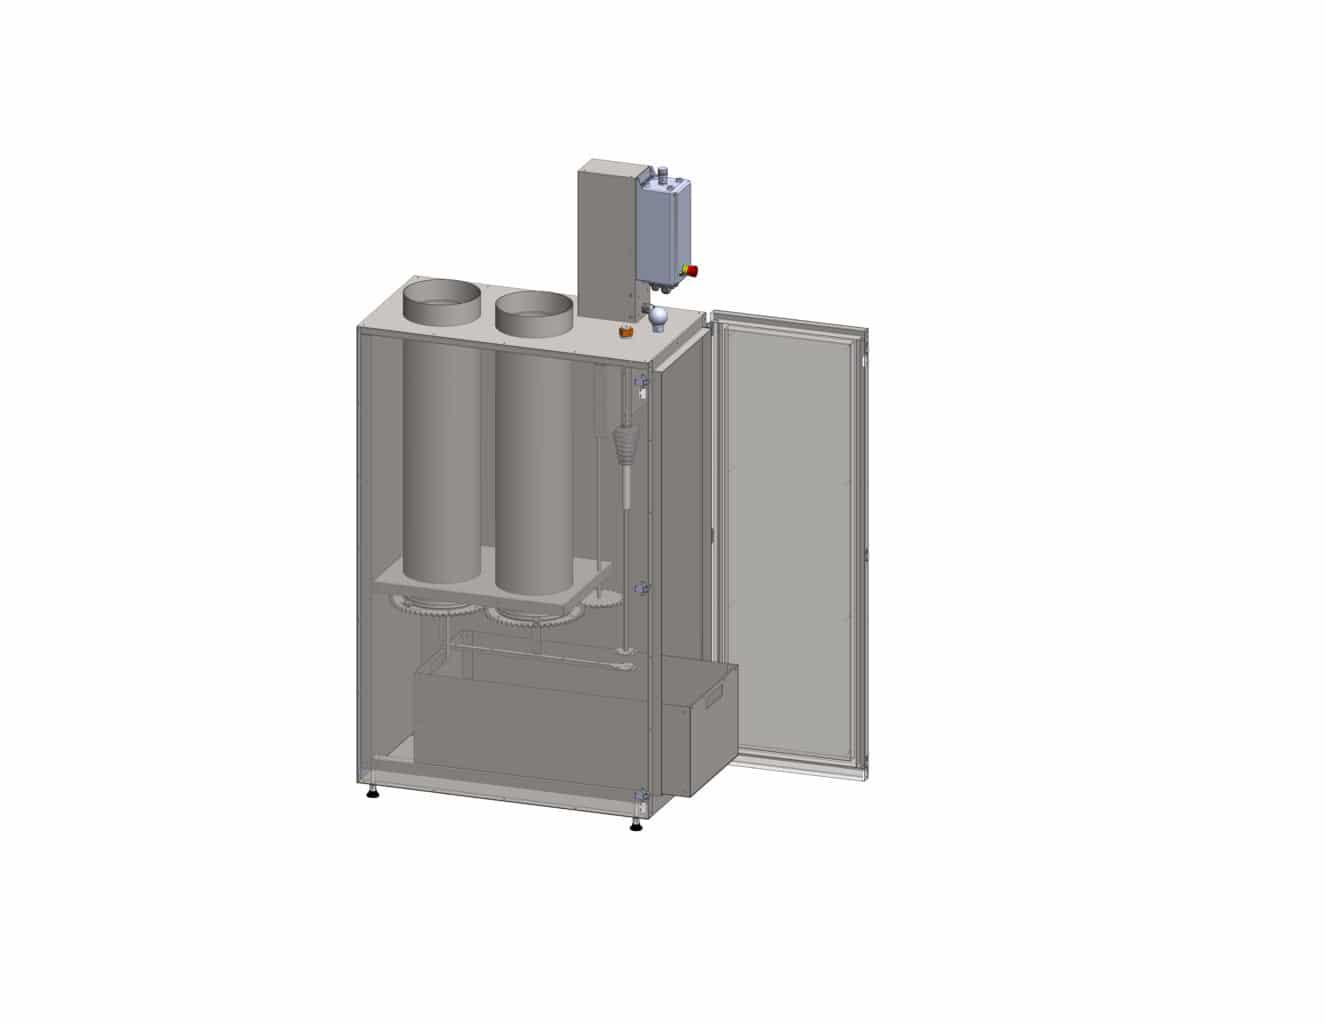 Elektrofilter OekoRona - Aufbau und Funktion